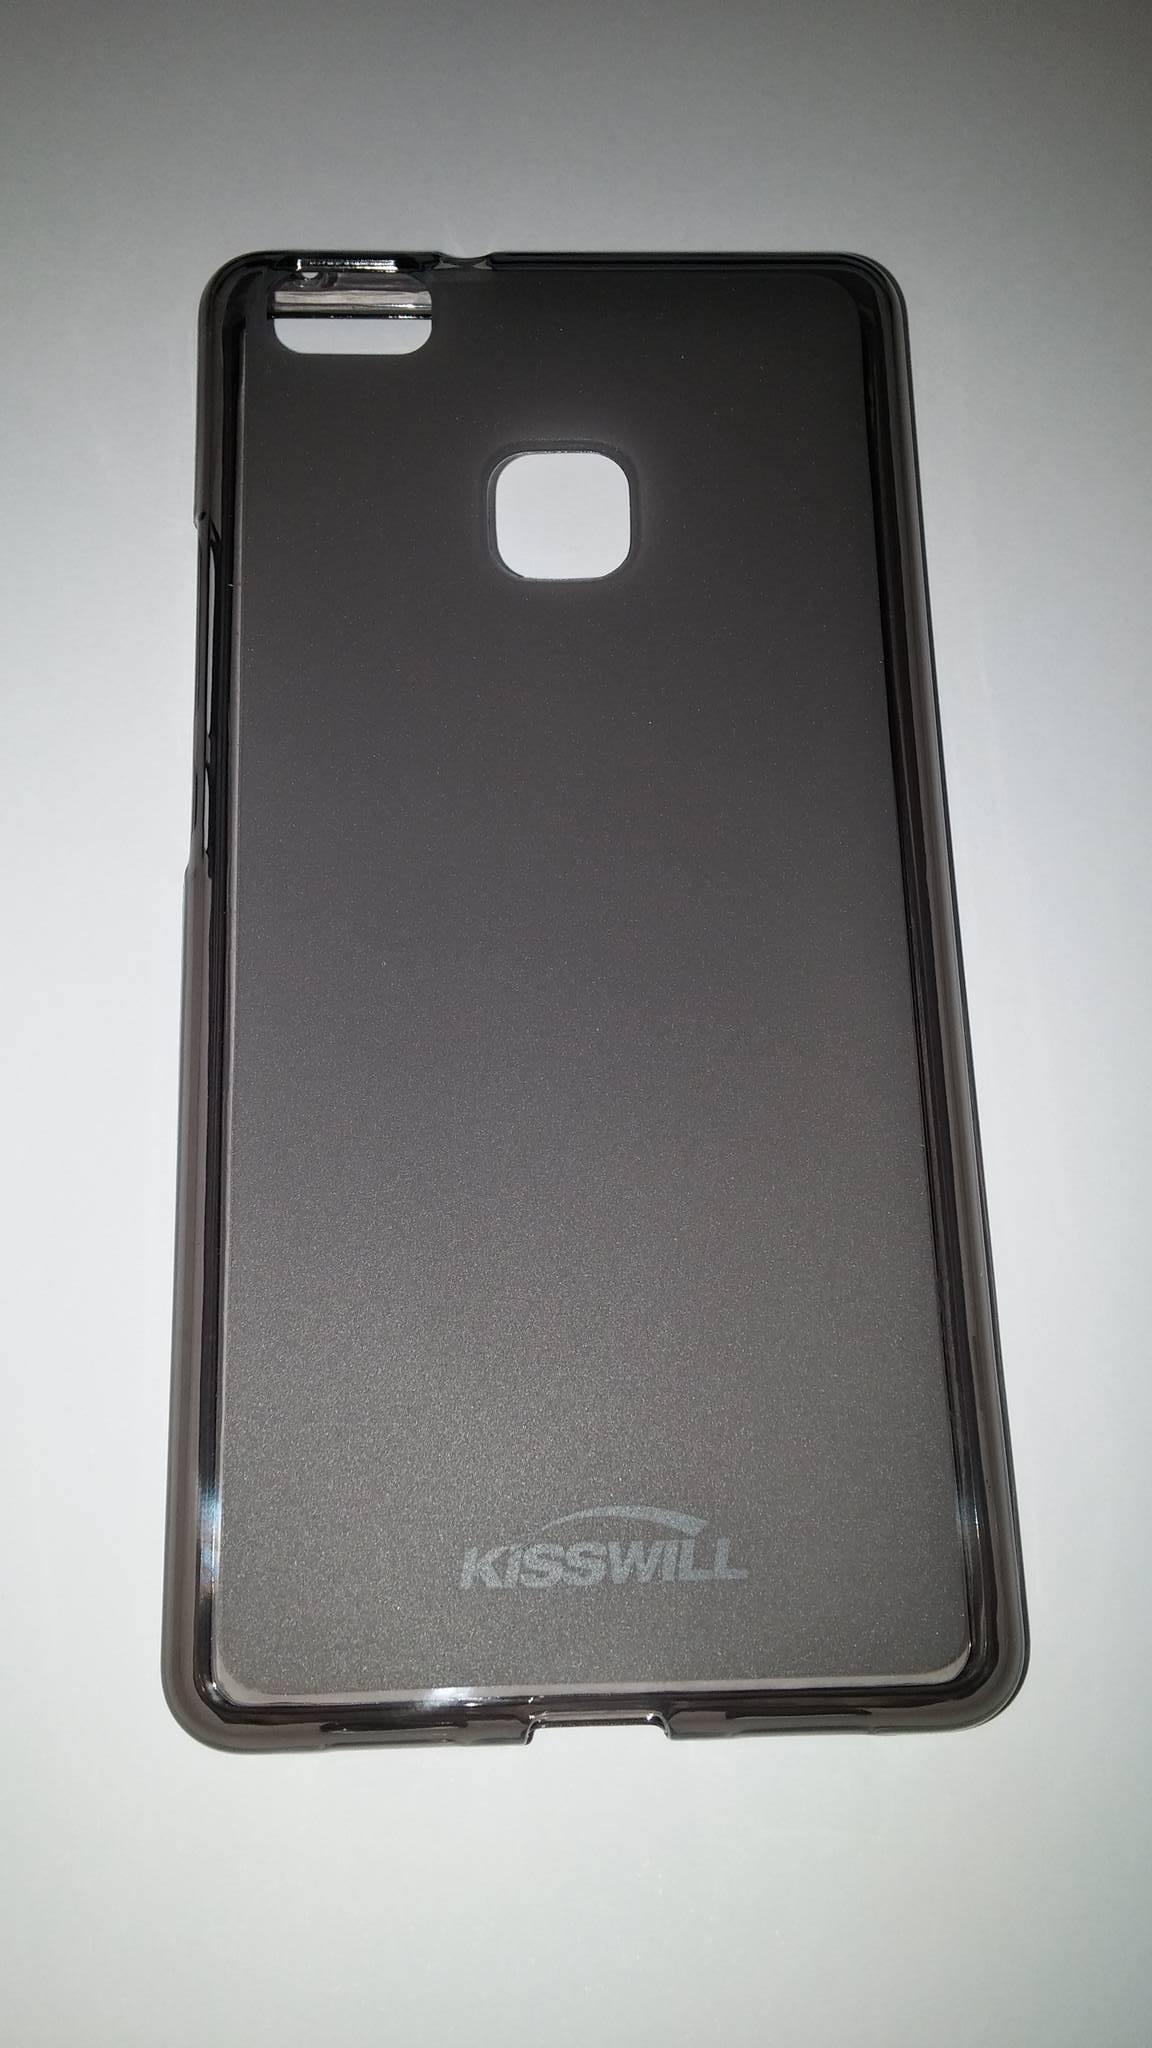 Silikonové pouzdro Kisswill pro mobilní telefon Huawei P9 LITE tmavé (Silikonový kryt či obal na mobil Huawei P9 LITE)